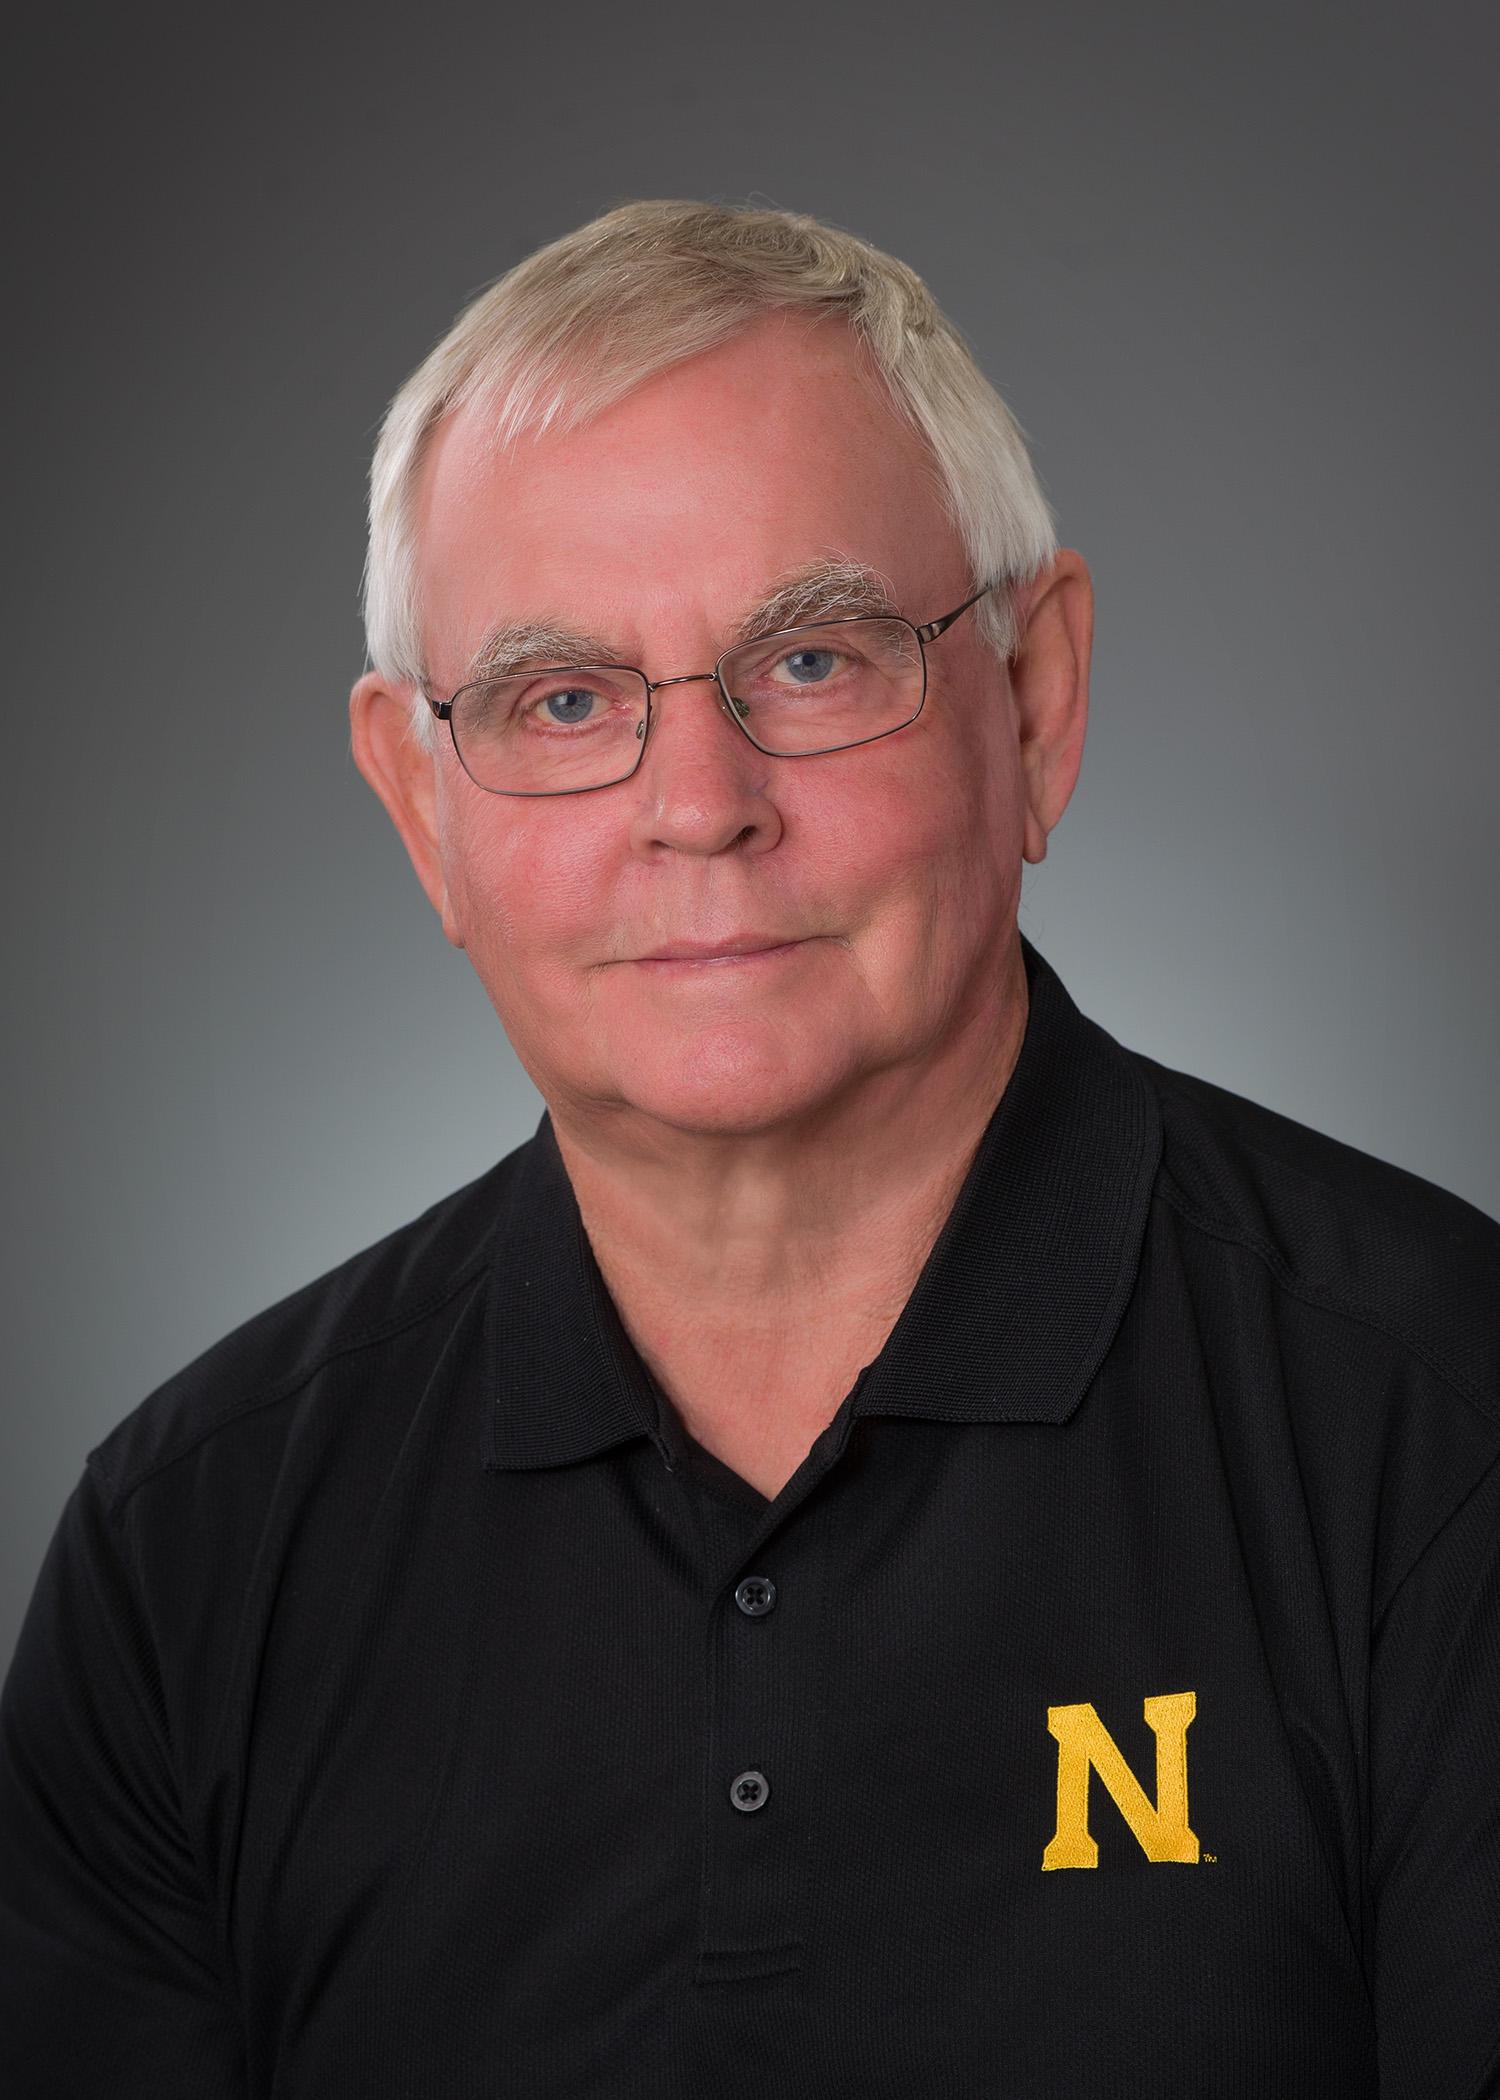 Chairman - Roger Pugh ('71), Consultant